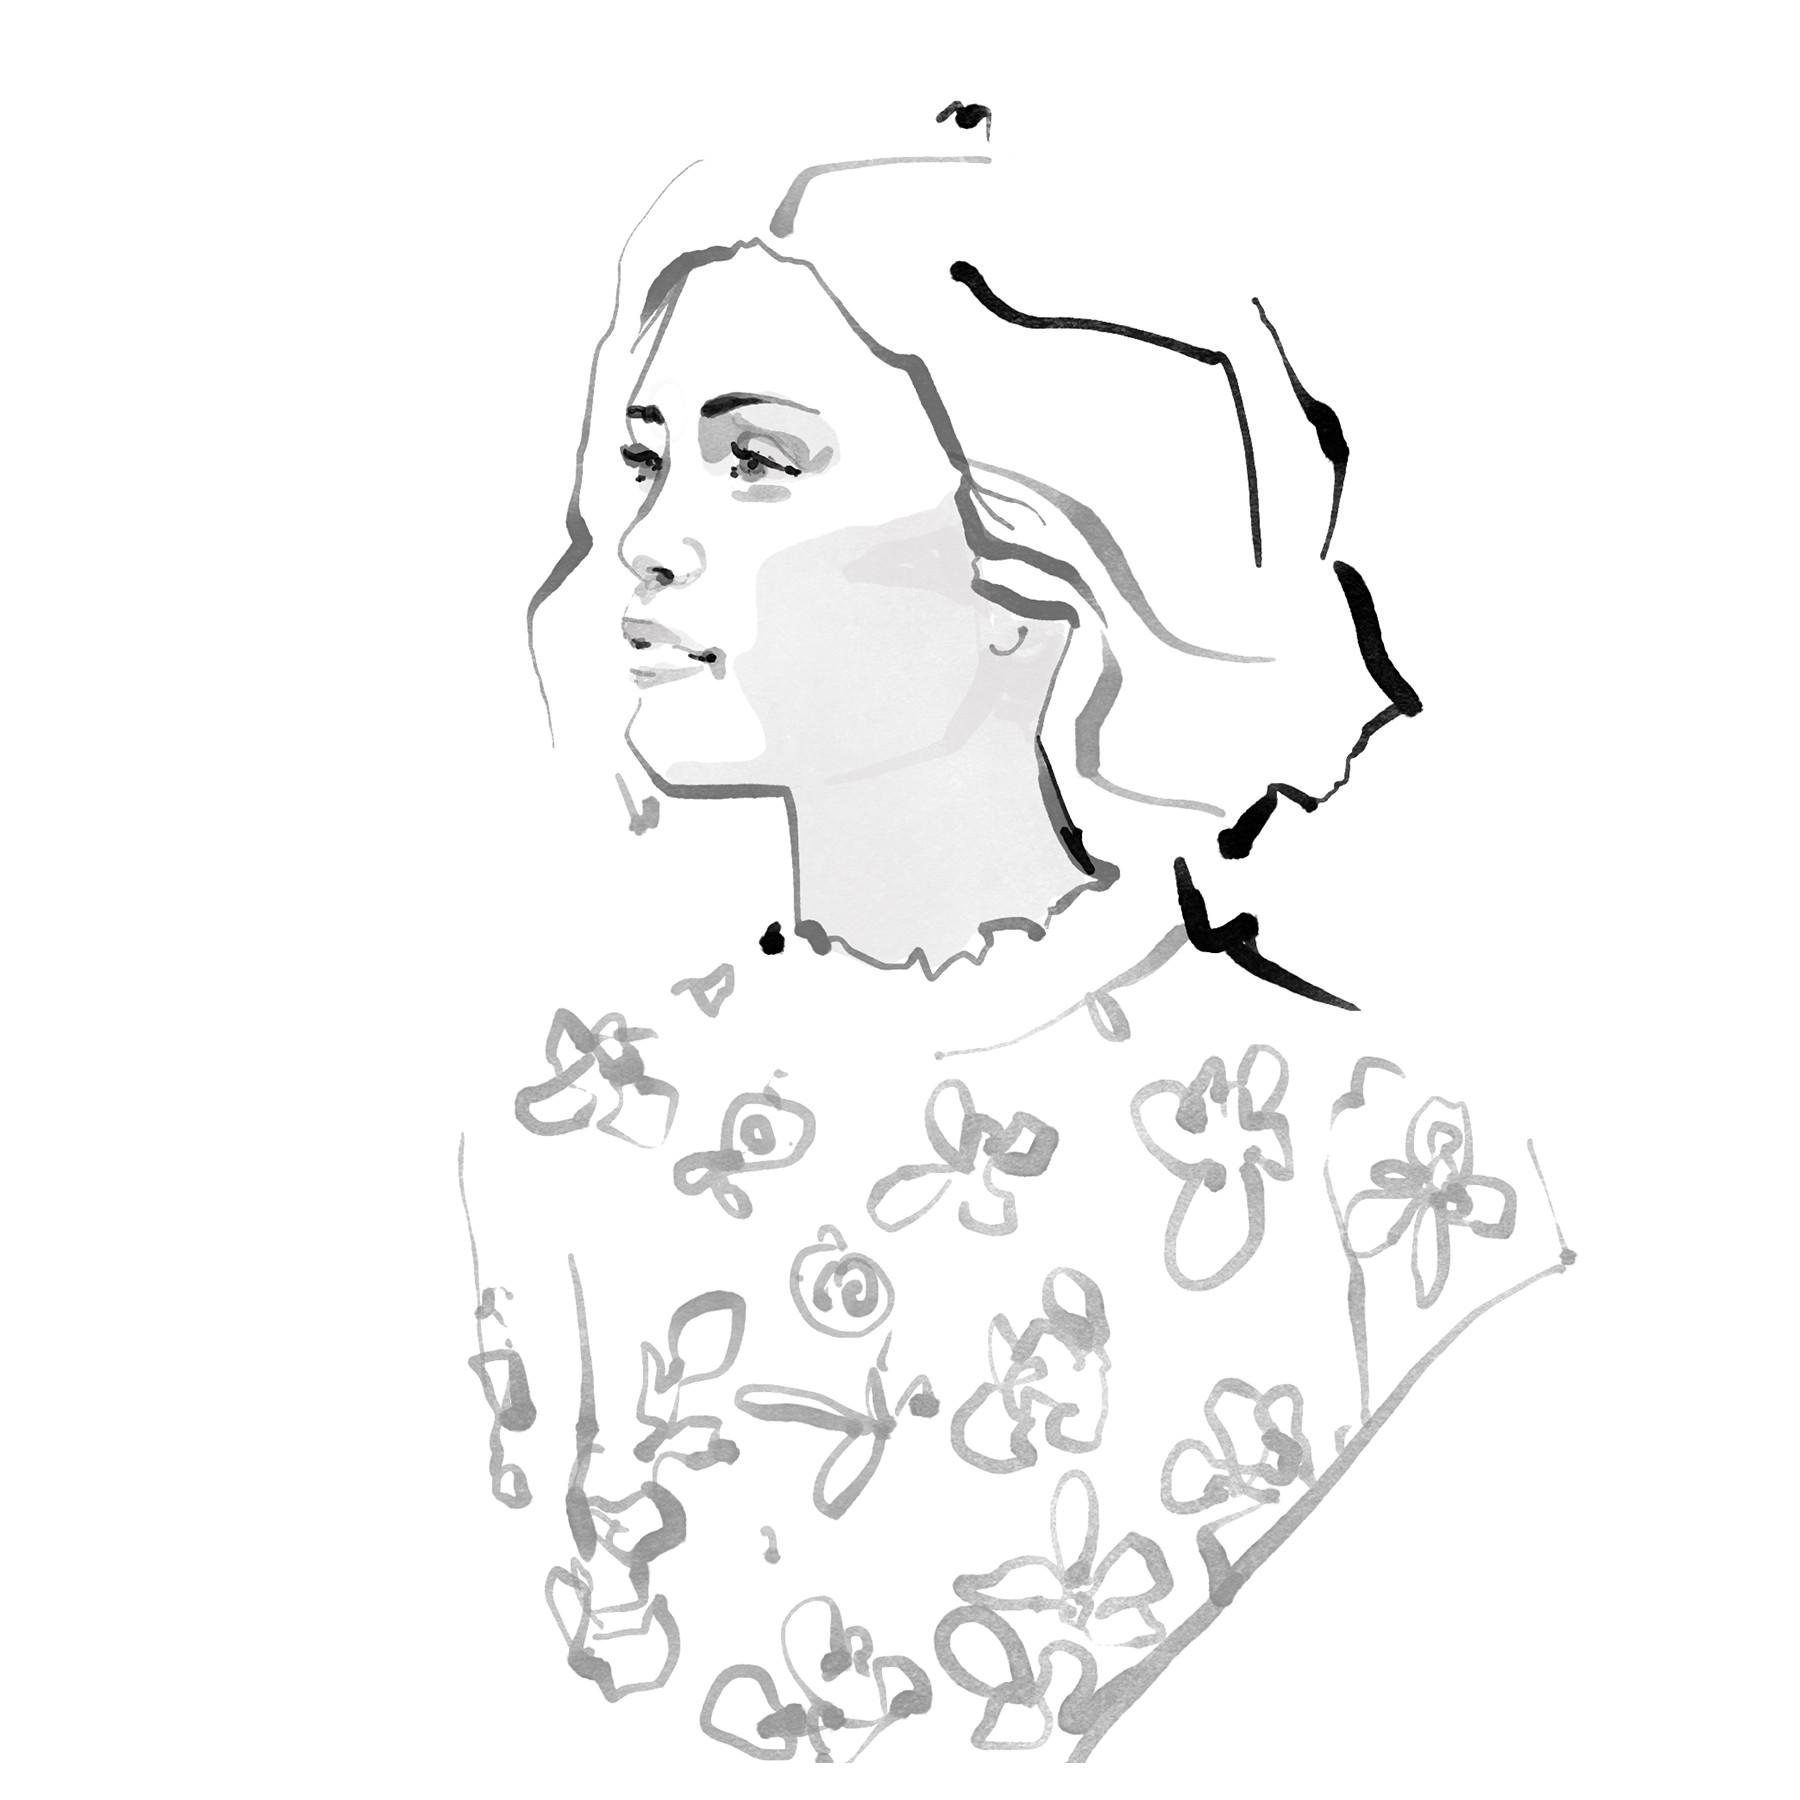 Inktober Fashion Illustrations 2017 day 3